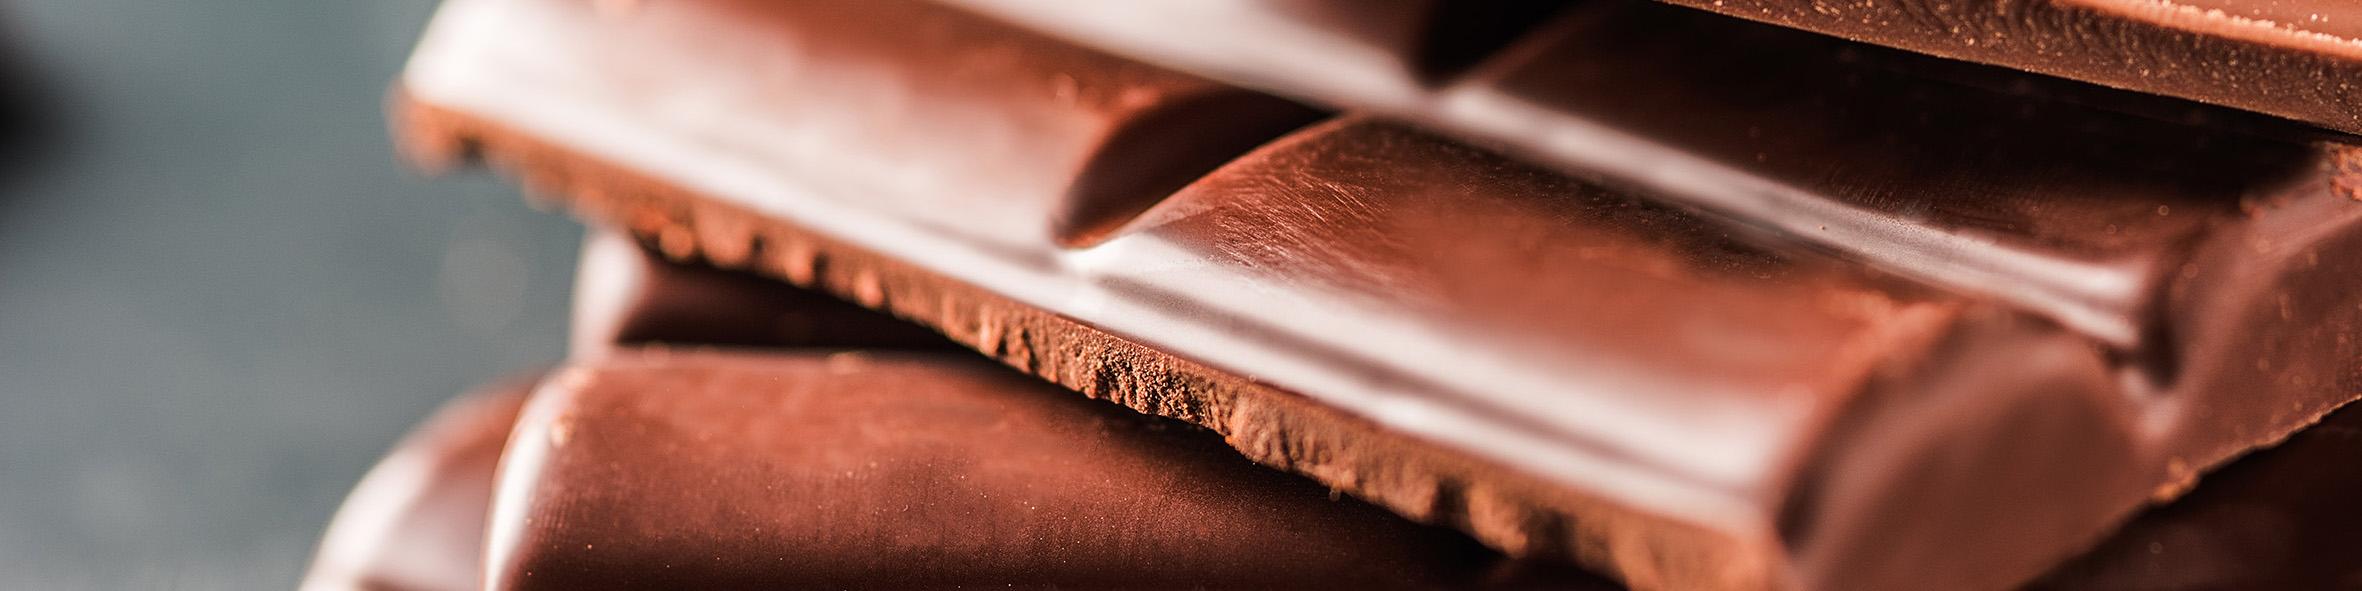 Blanxart dunkle Schokolade